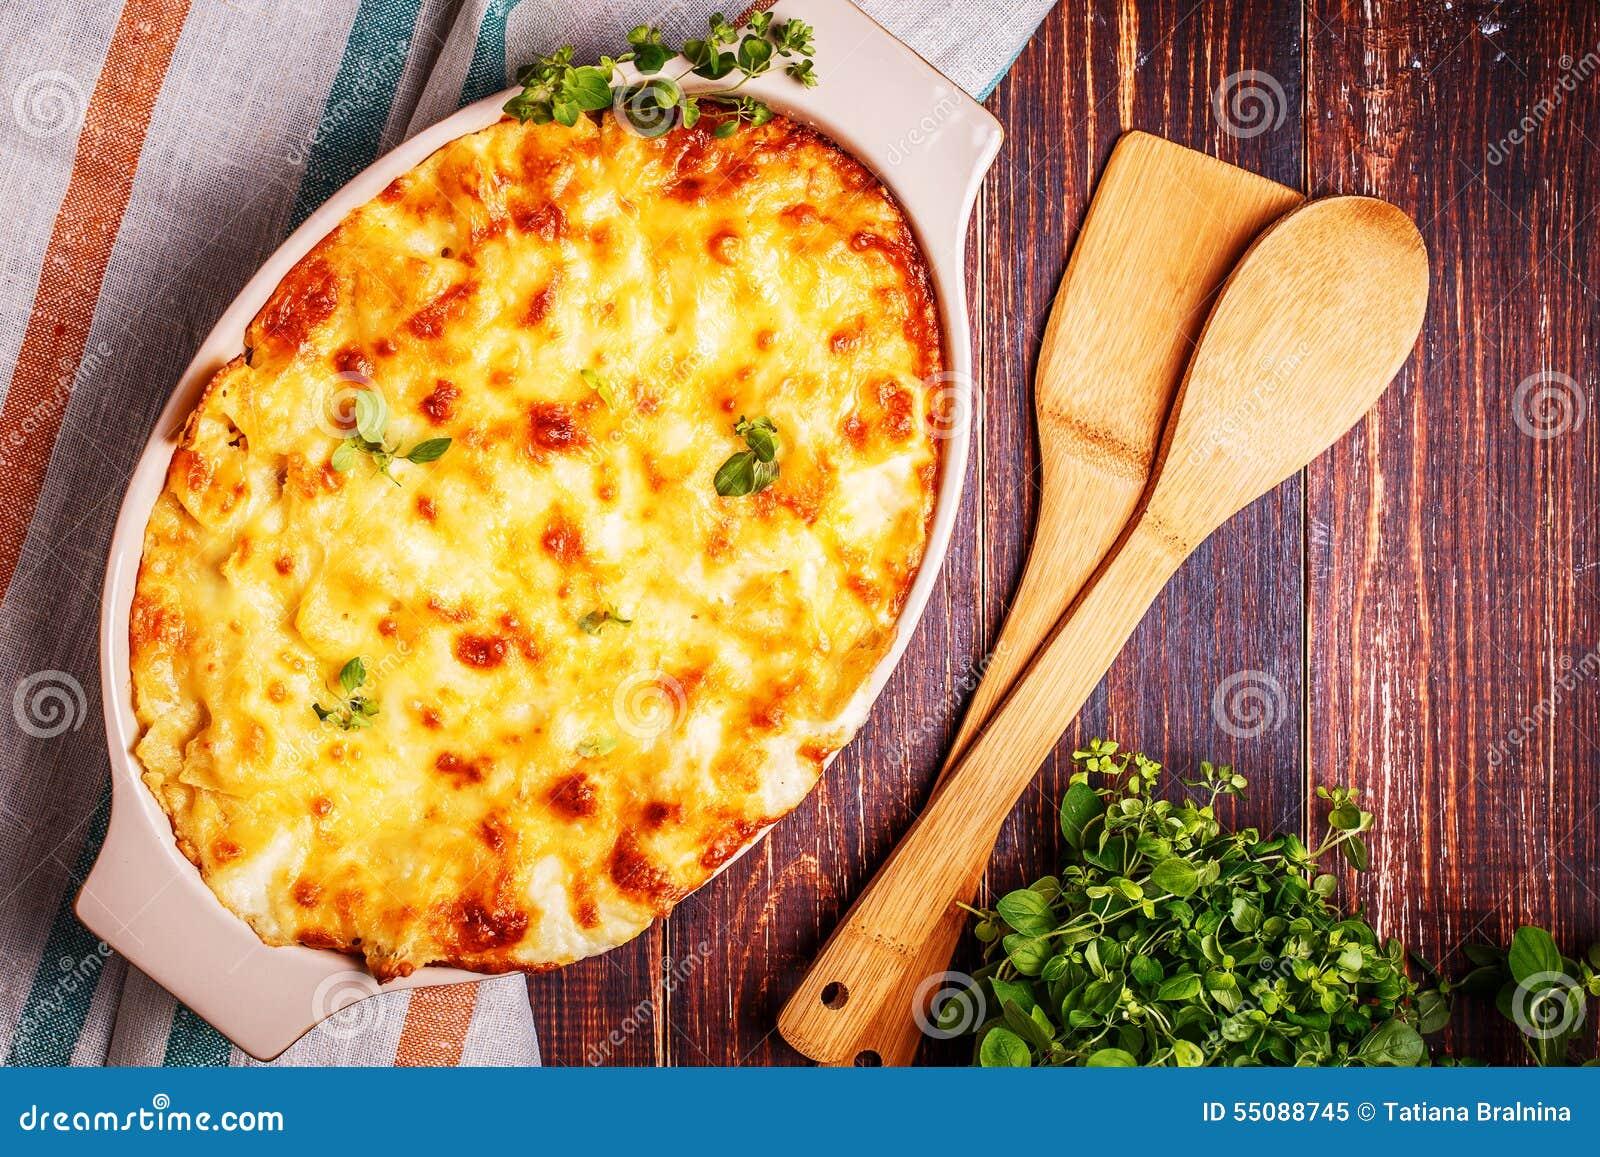 Macaronis et fromage cuits au four